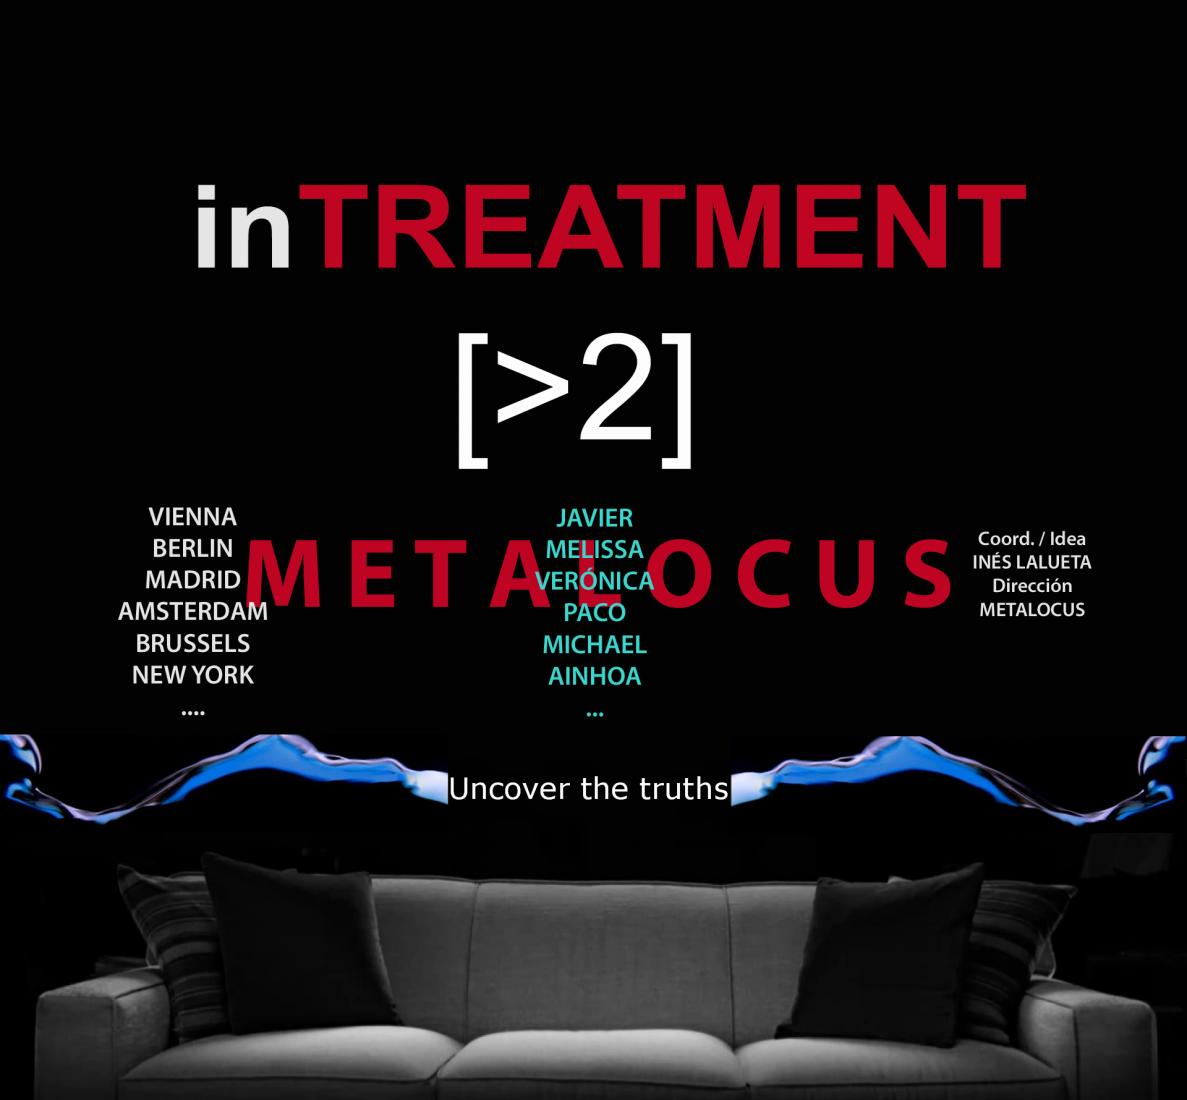 Portada de INTREATMENT [>2] - METALOCUS.